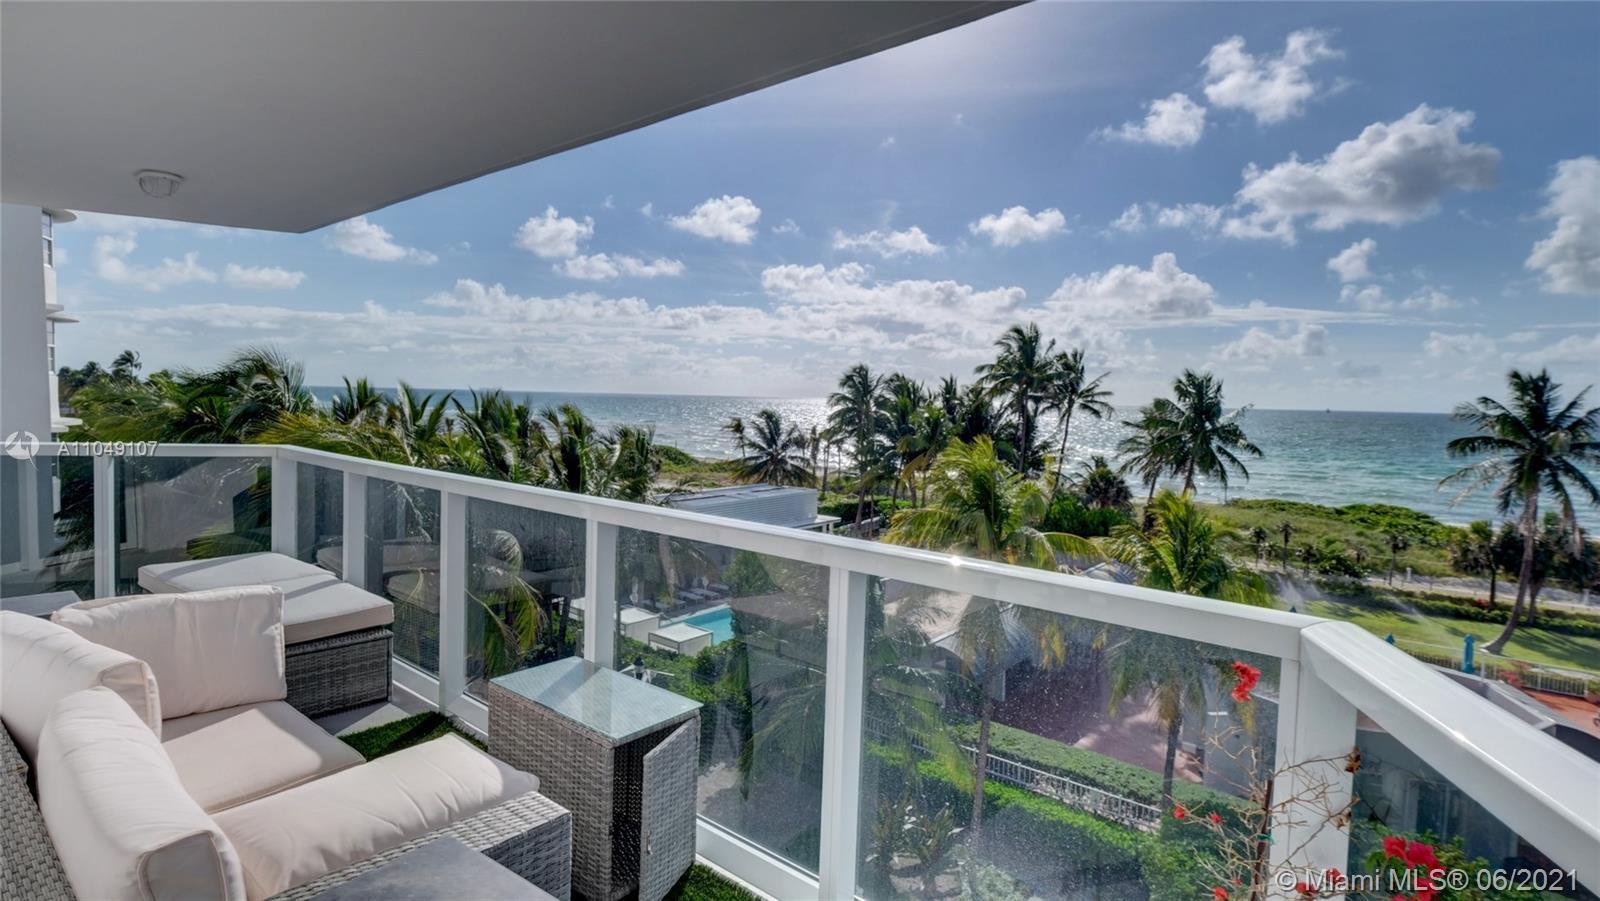 Unit , Miami Beach, Florida 33140